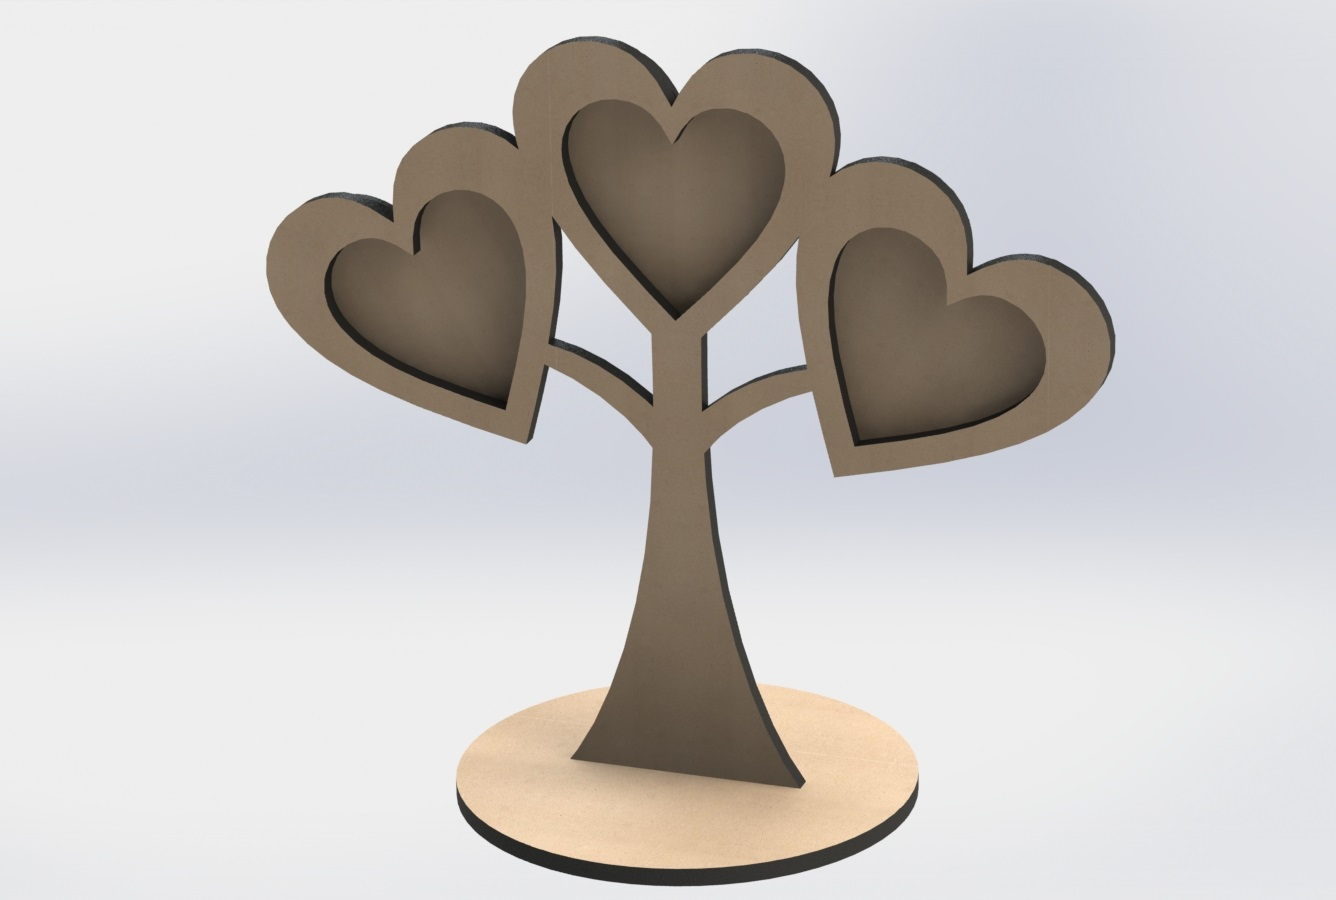 Laser Cut Wooden Heart Photo Frames Tree Shaped Free DXF File